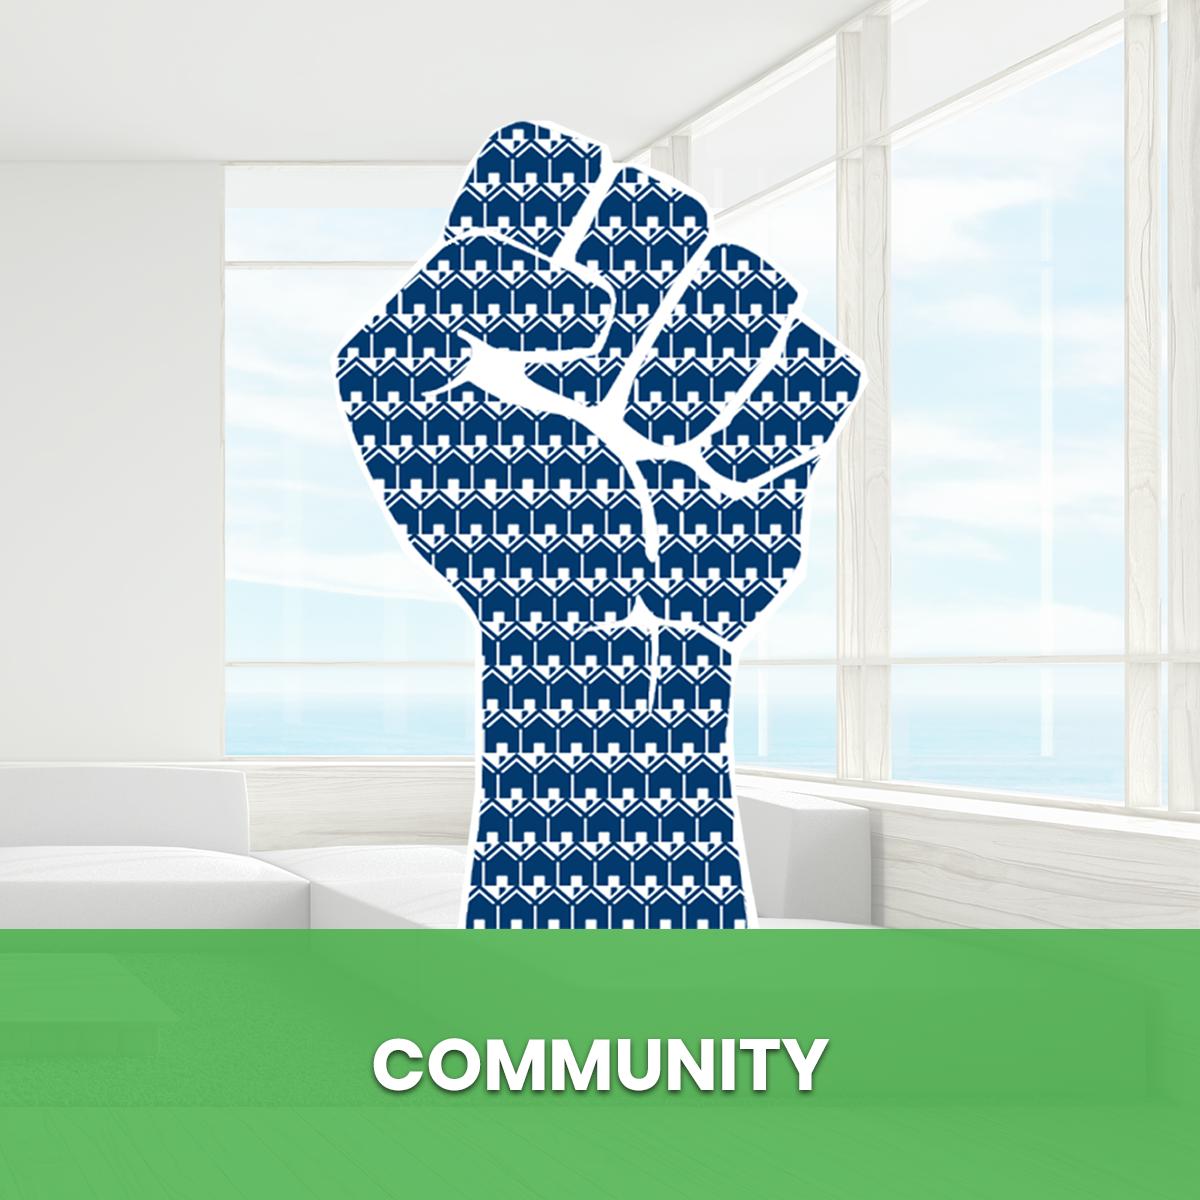 Community - Green